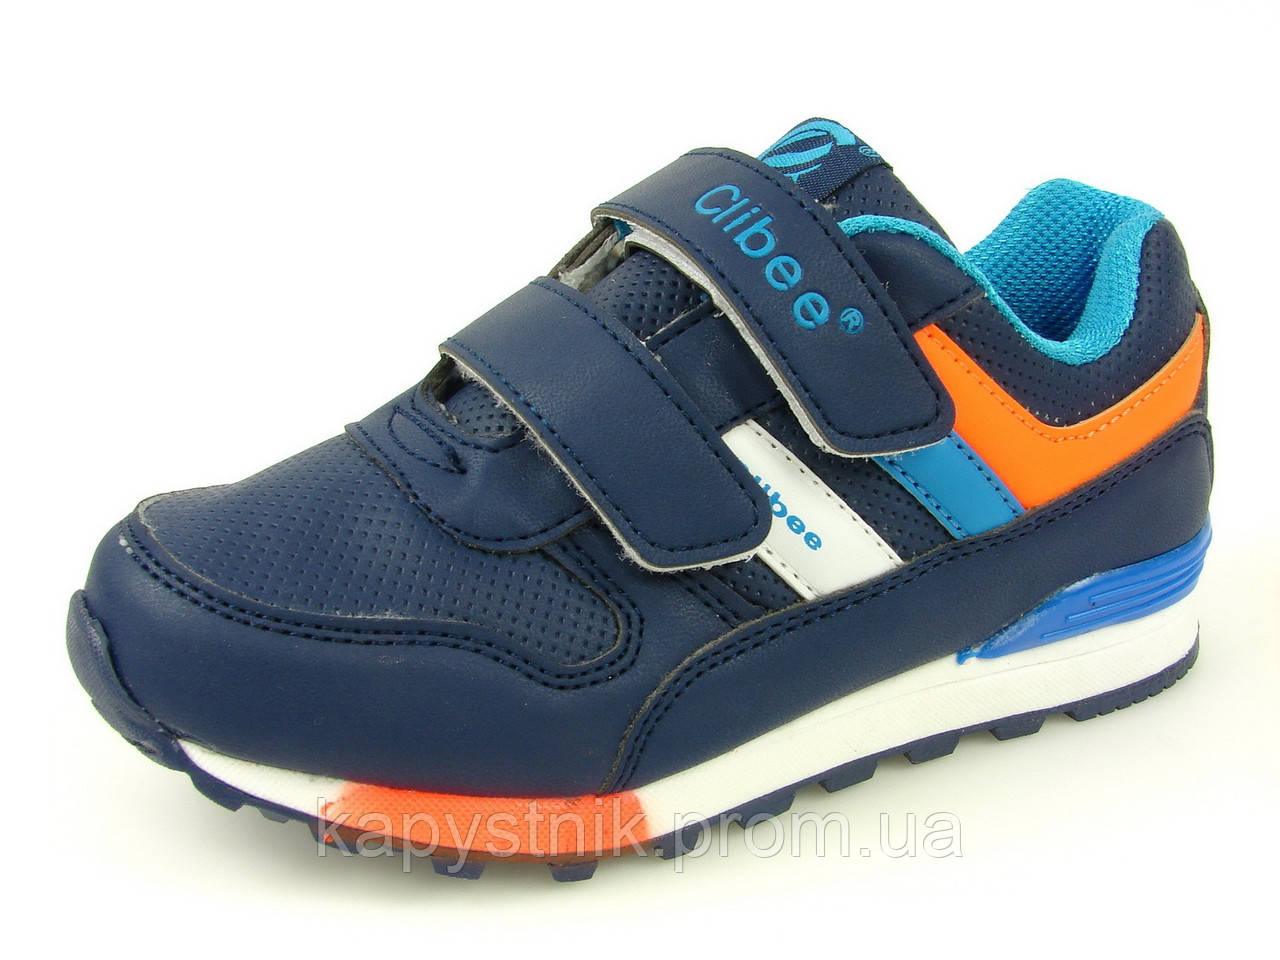 d8bc7d2ad09d Детские кроссовки для мальчика р.31-34 ТМ Clibee  F-635 Синий+Оранж ...